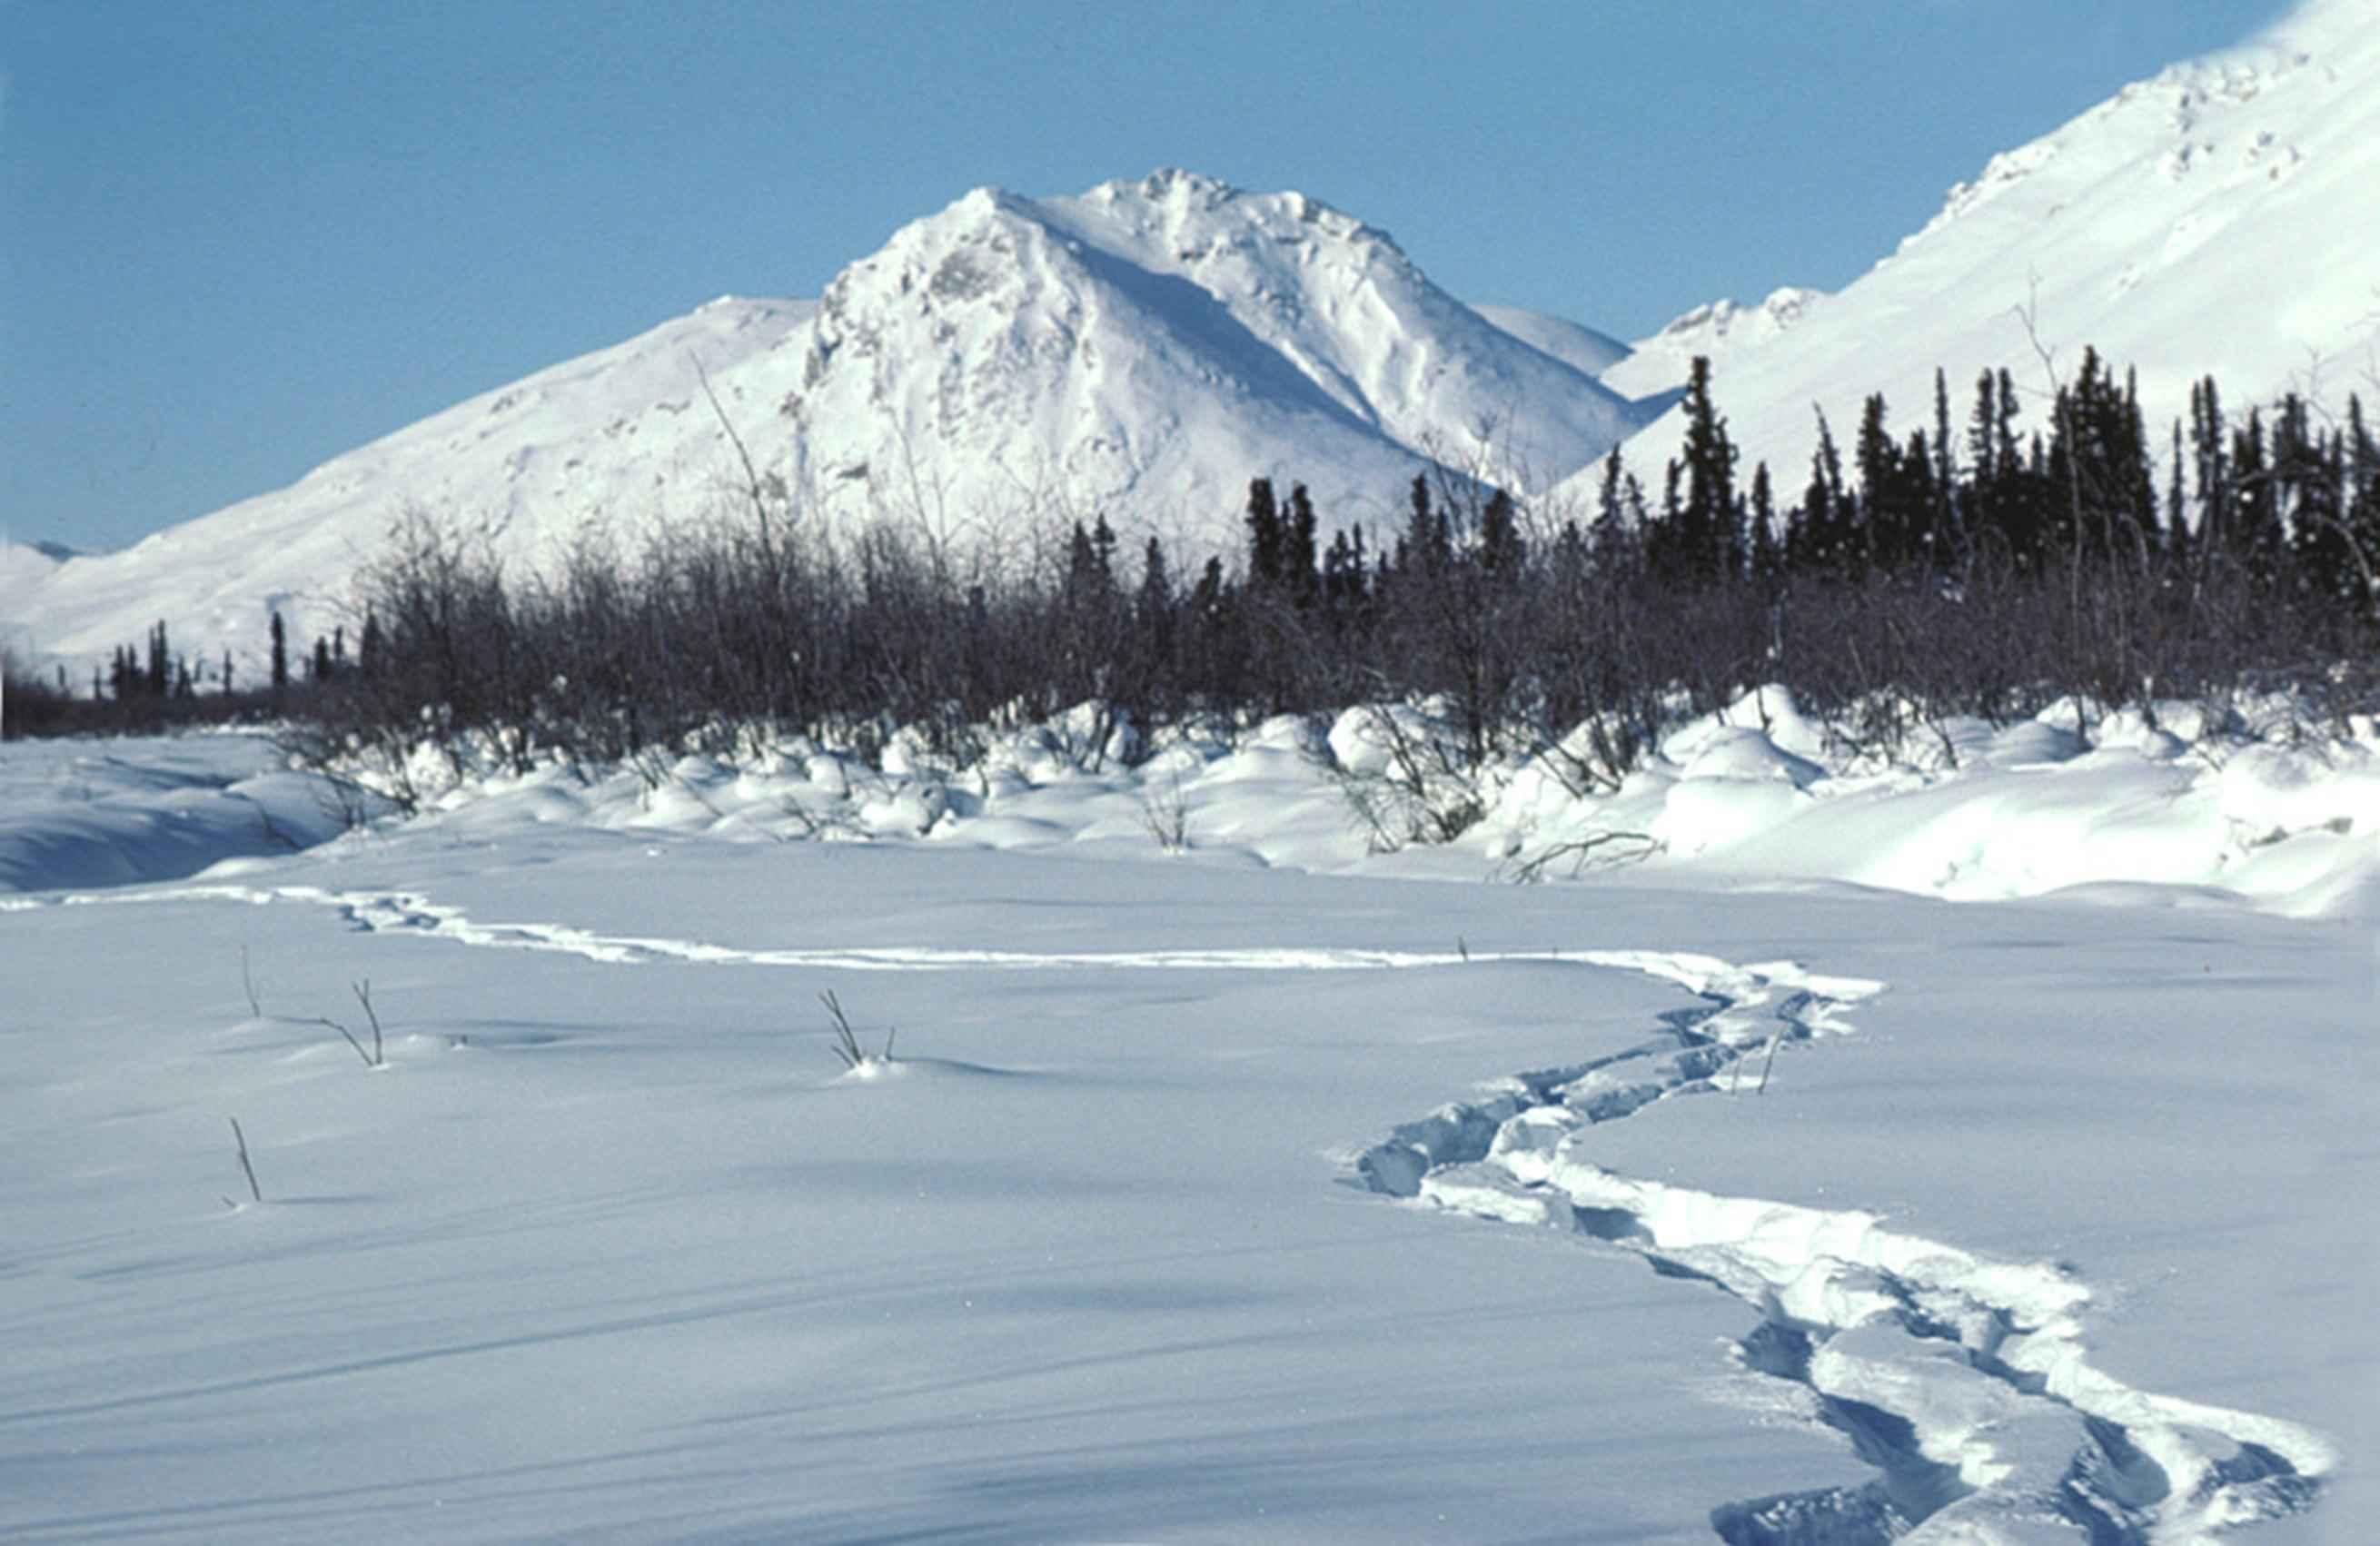 Human Nature Winter Wonderland